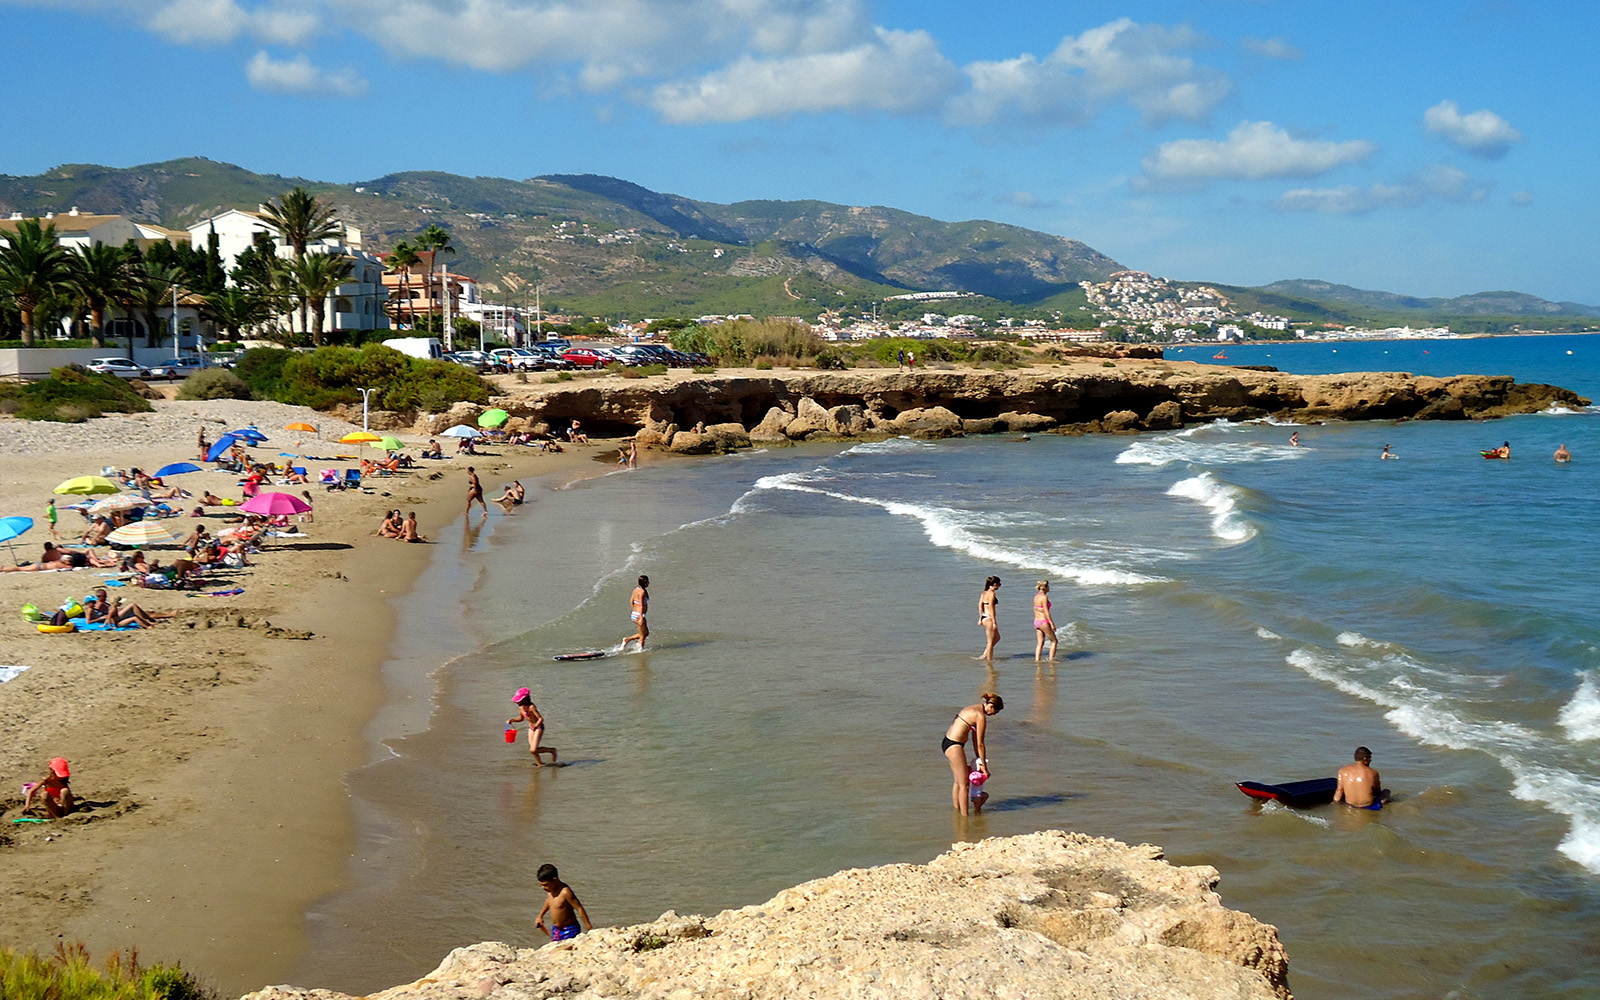 Turismo-Alcossebre-Playa-del-Moro-Alcossebre